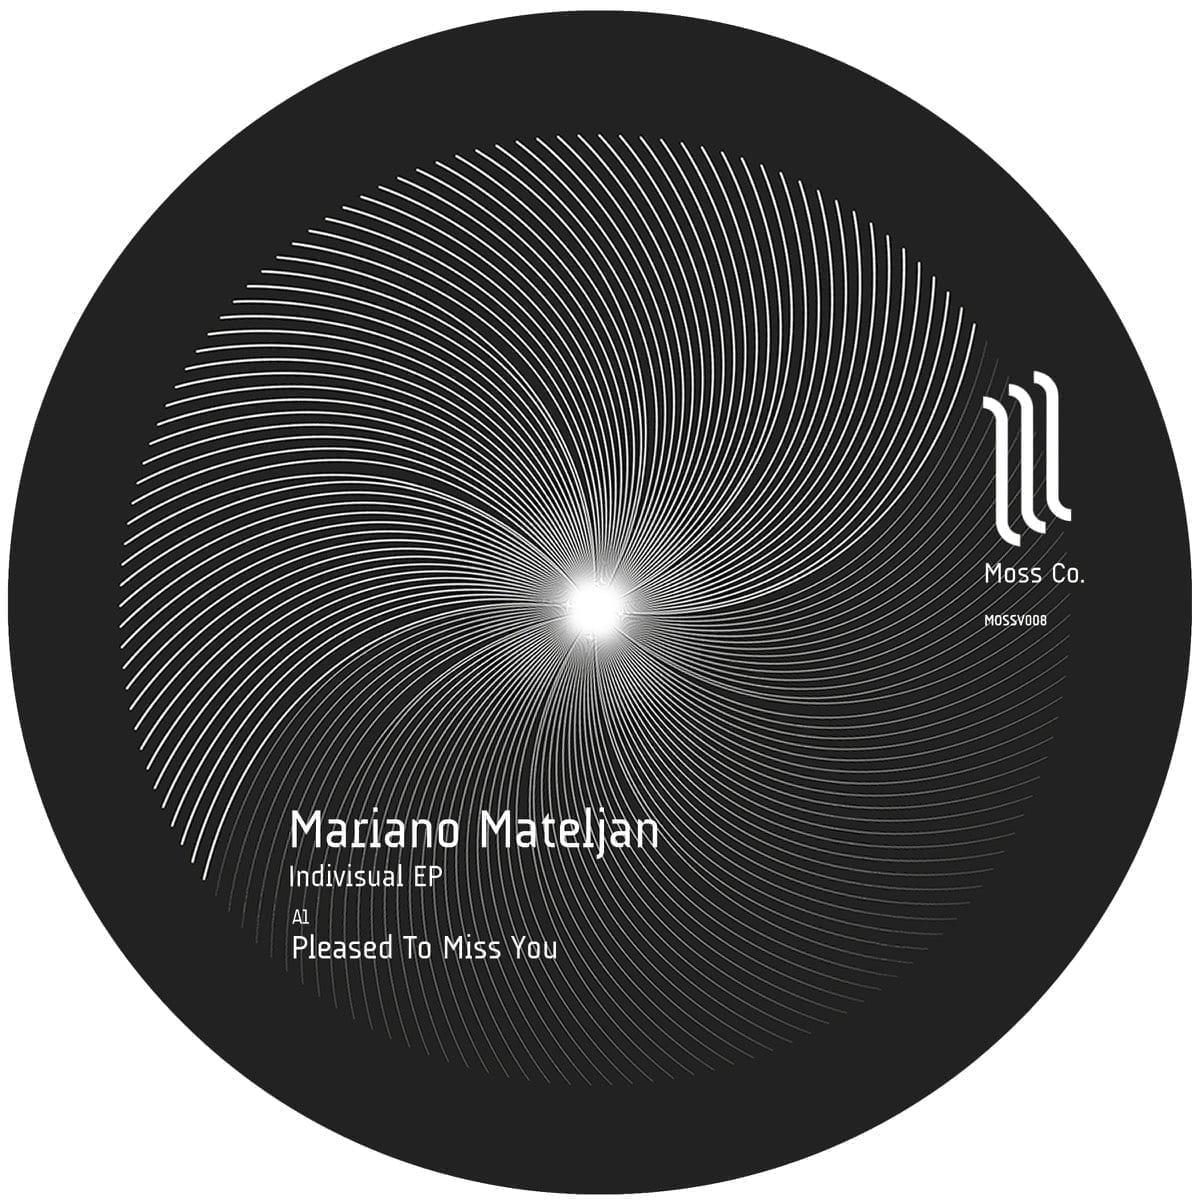 MOSSV008 - Mariano Mateljan - Indivisual EP